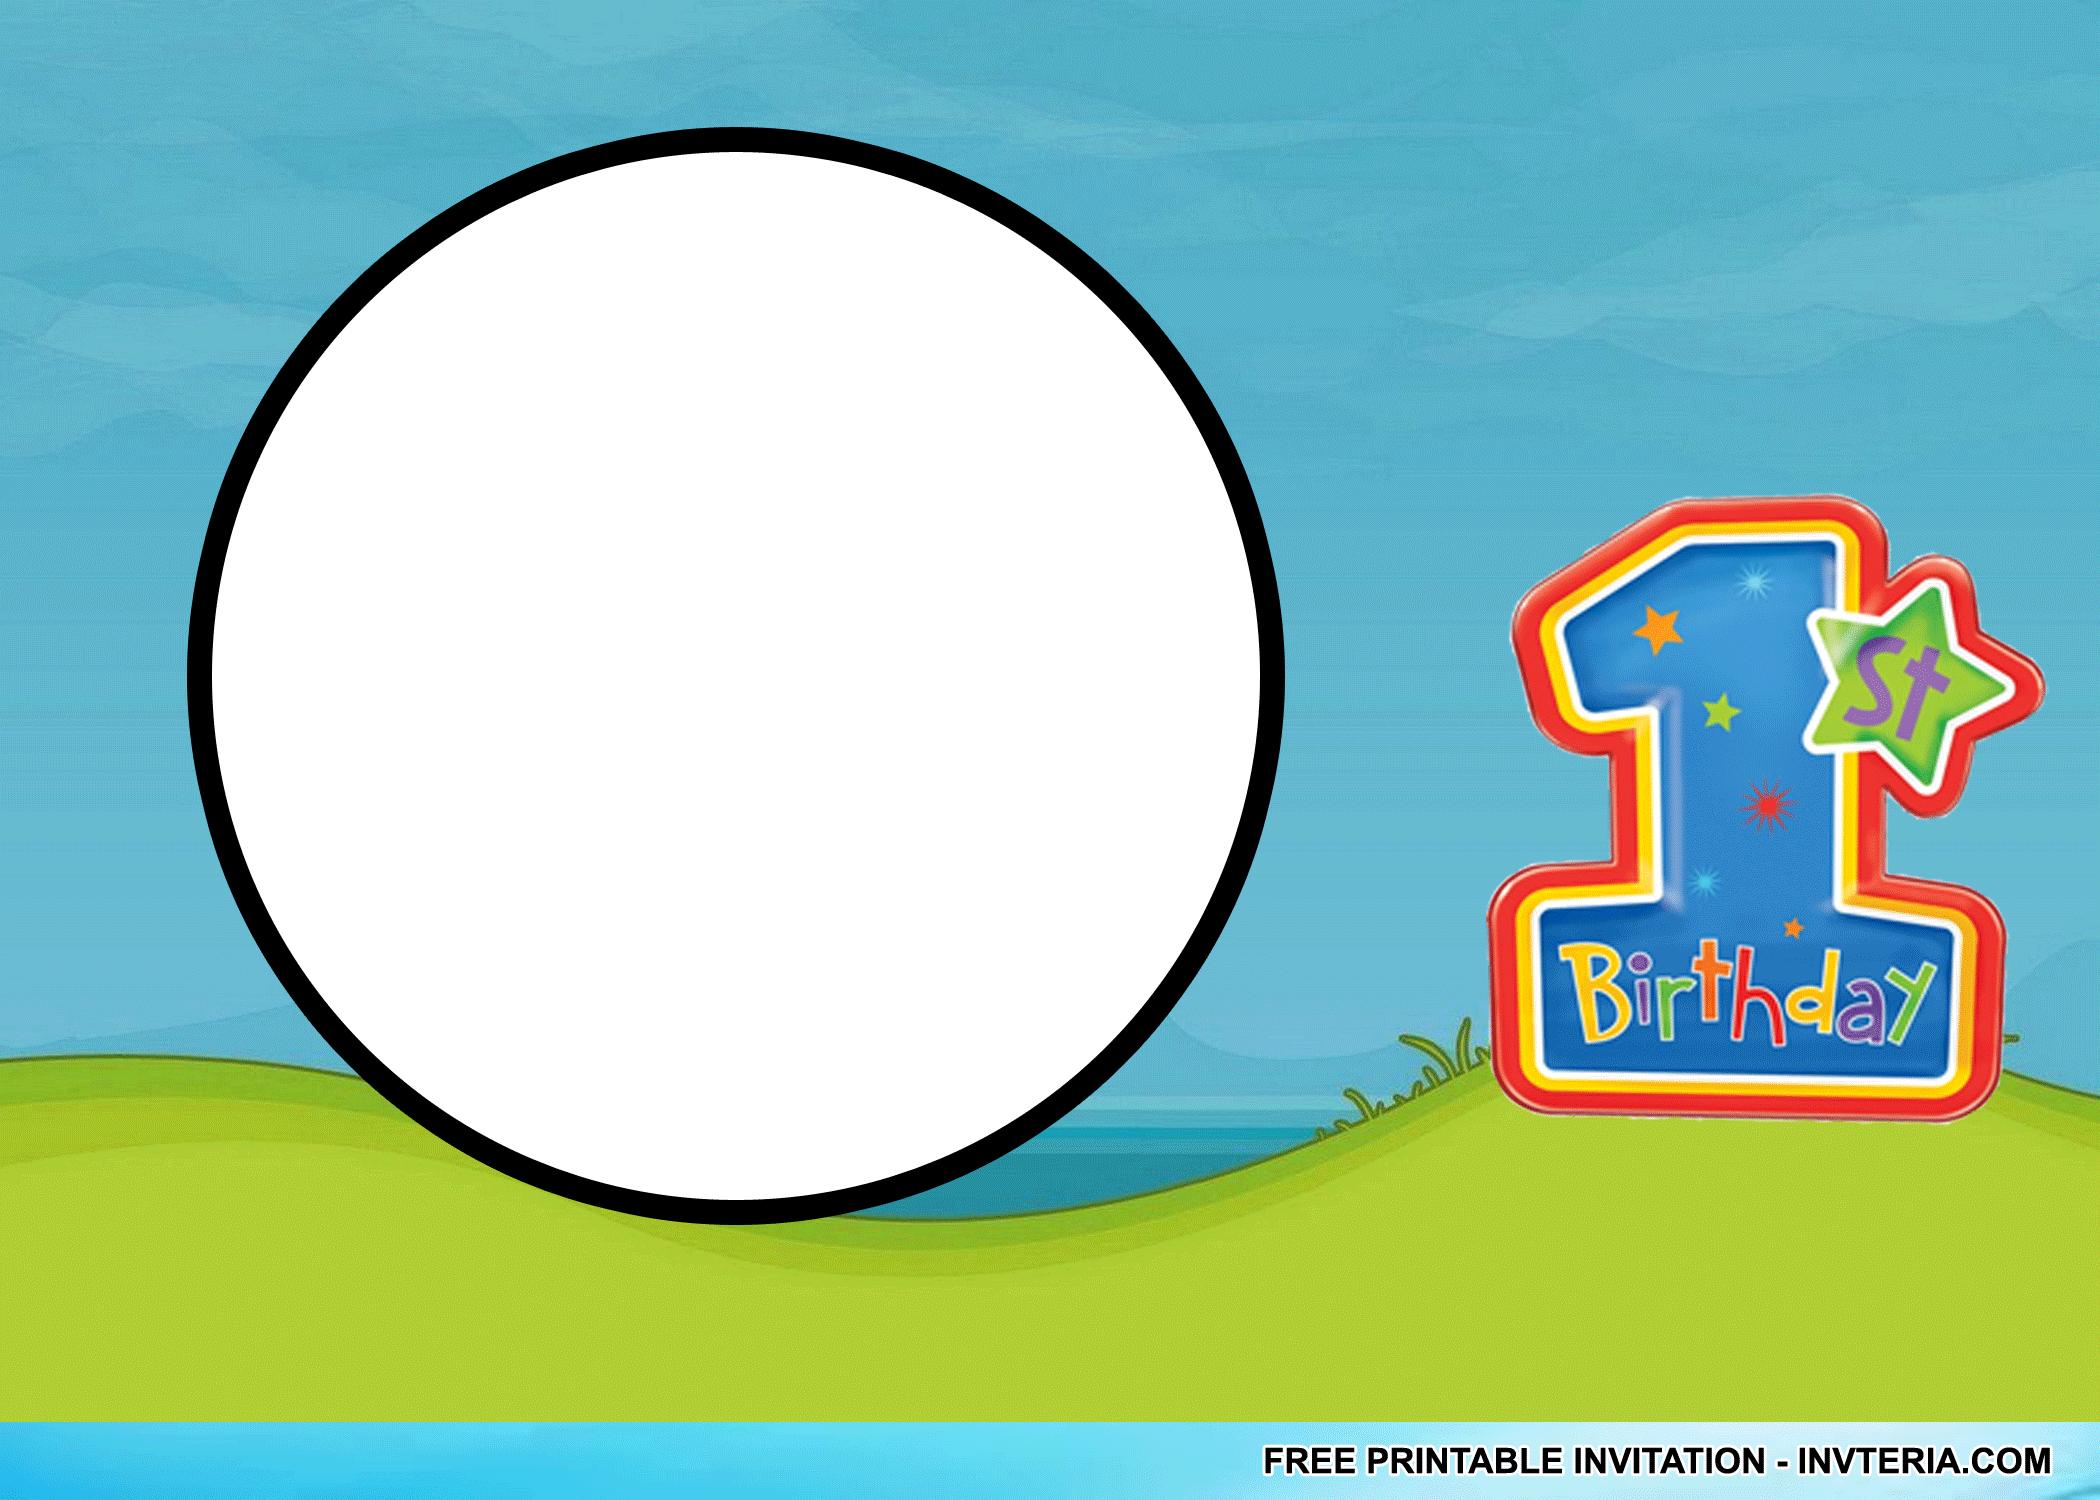 FINE FREE PRINTABLE 1ST BIRTHDAY INVITATIONS BOY IDEA